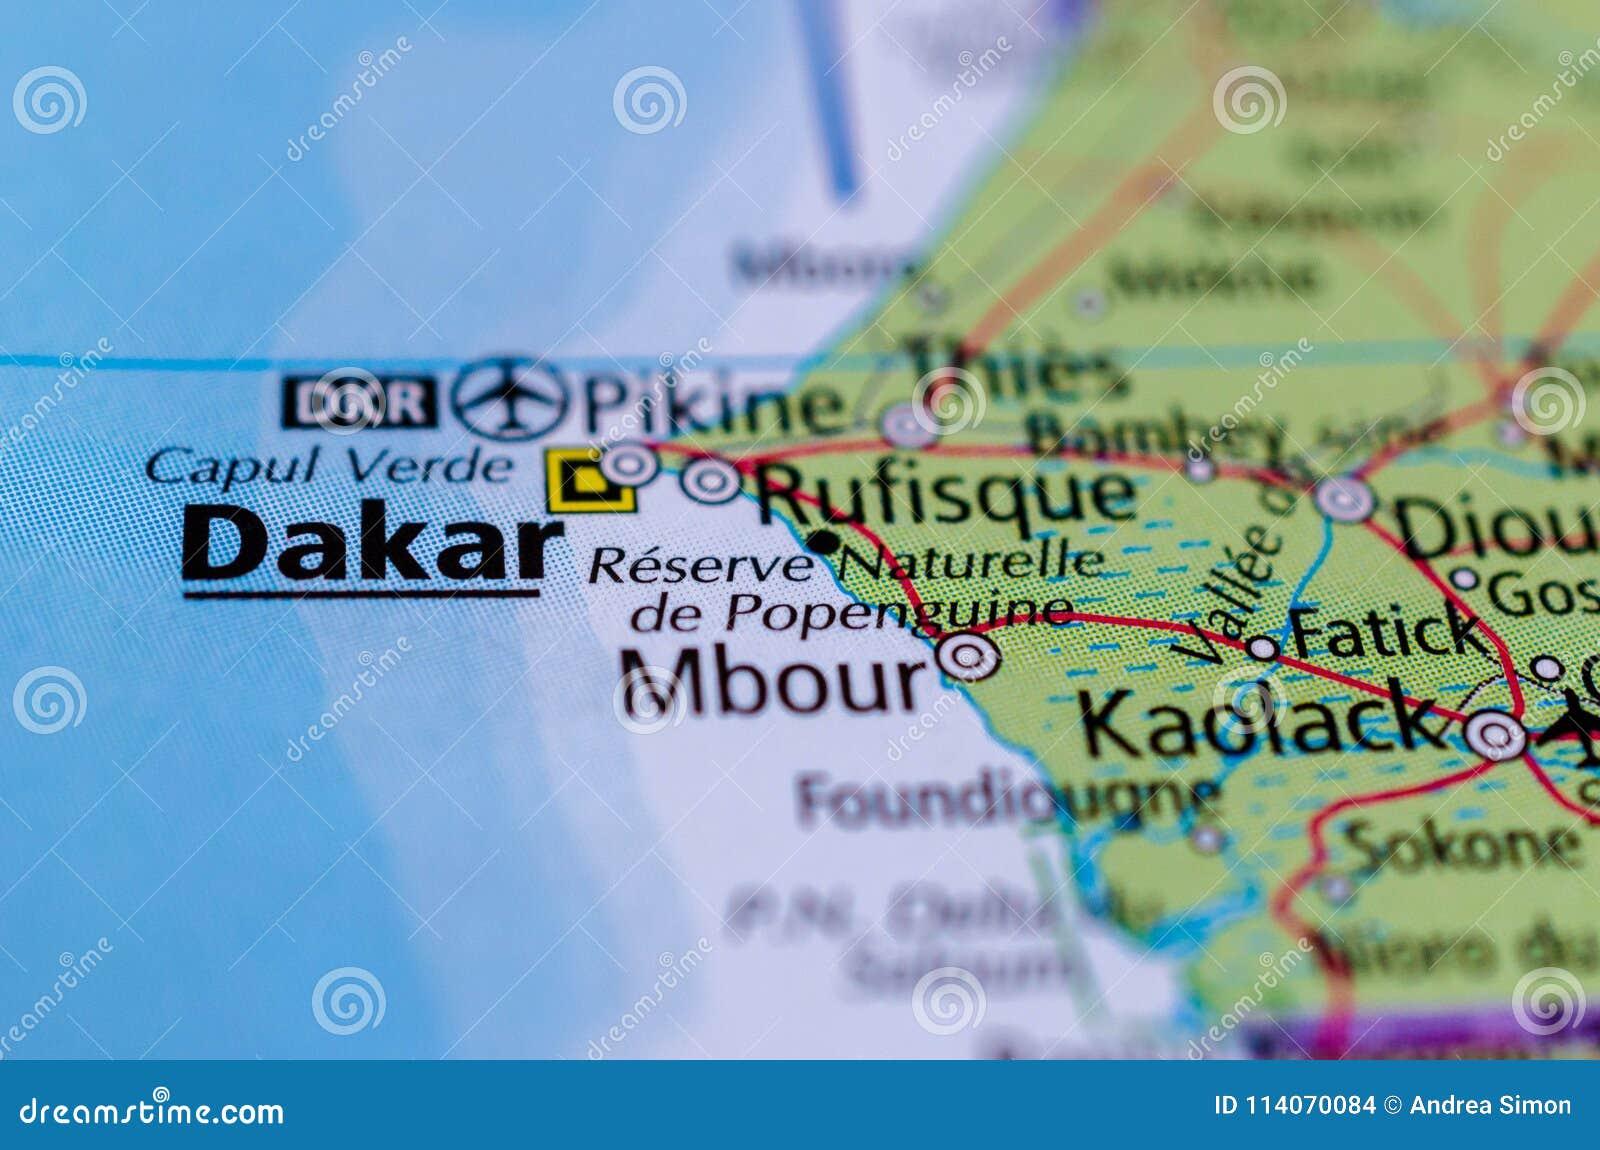 Dakar on map stock photo. Image of close, maps, atlas ... on abuja nigeria map, lusaka zambia map, johannesburg map, porto novo benin map, africa map, luanda angola map, sahara desert map, beijing china map, banjul gambia map, lagos nigeria map, nairobi kenya map, abidjan ivory coast map, diourbel senegal map, cape verde map, malabo equatorial guinea map, moscow russia map, yaounde cameroon map, warsaw poland map, cairo egypt map, ouagadougou burkina faso map,